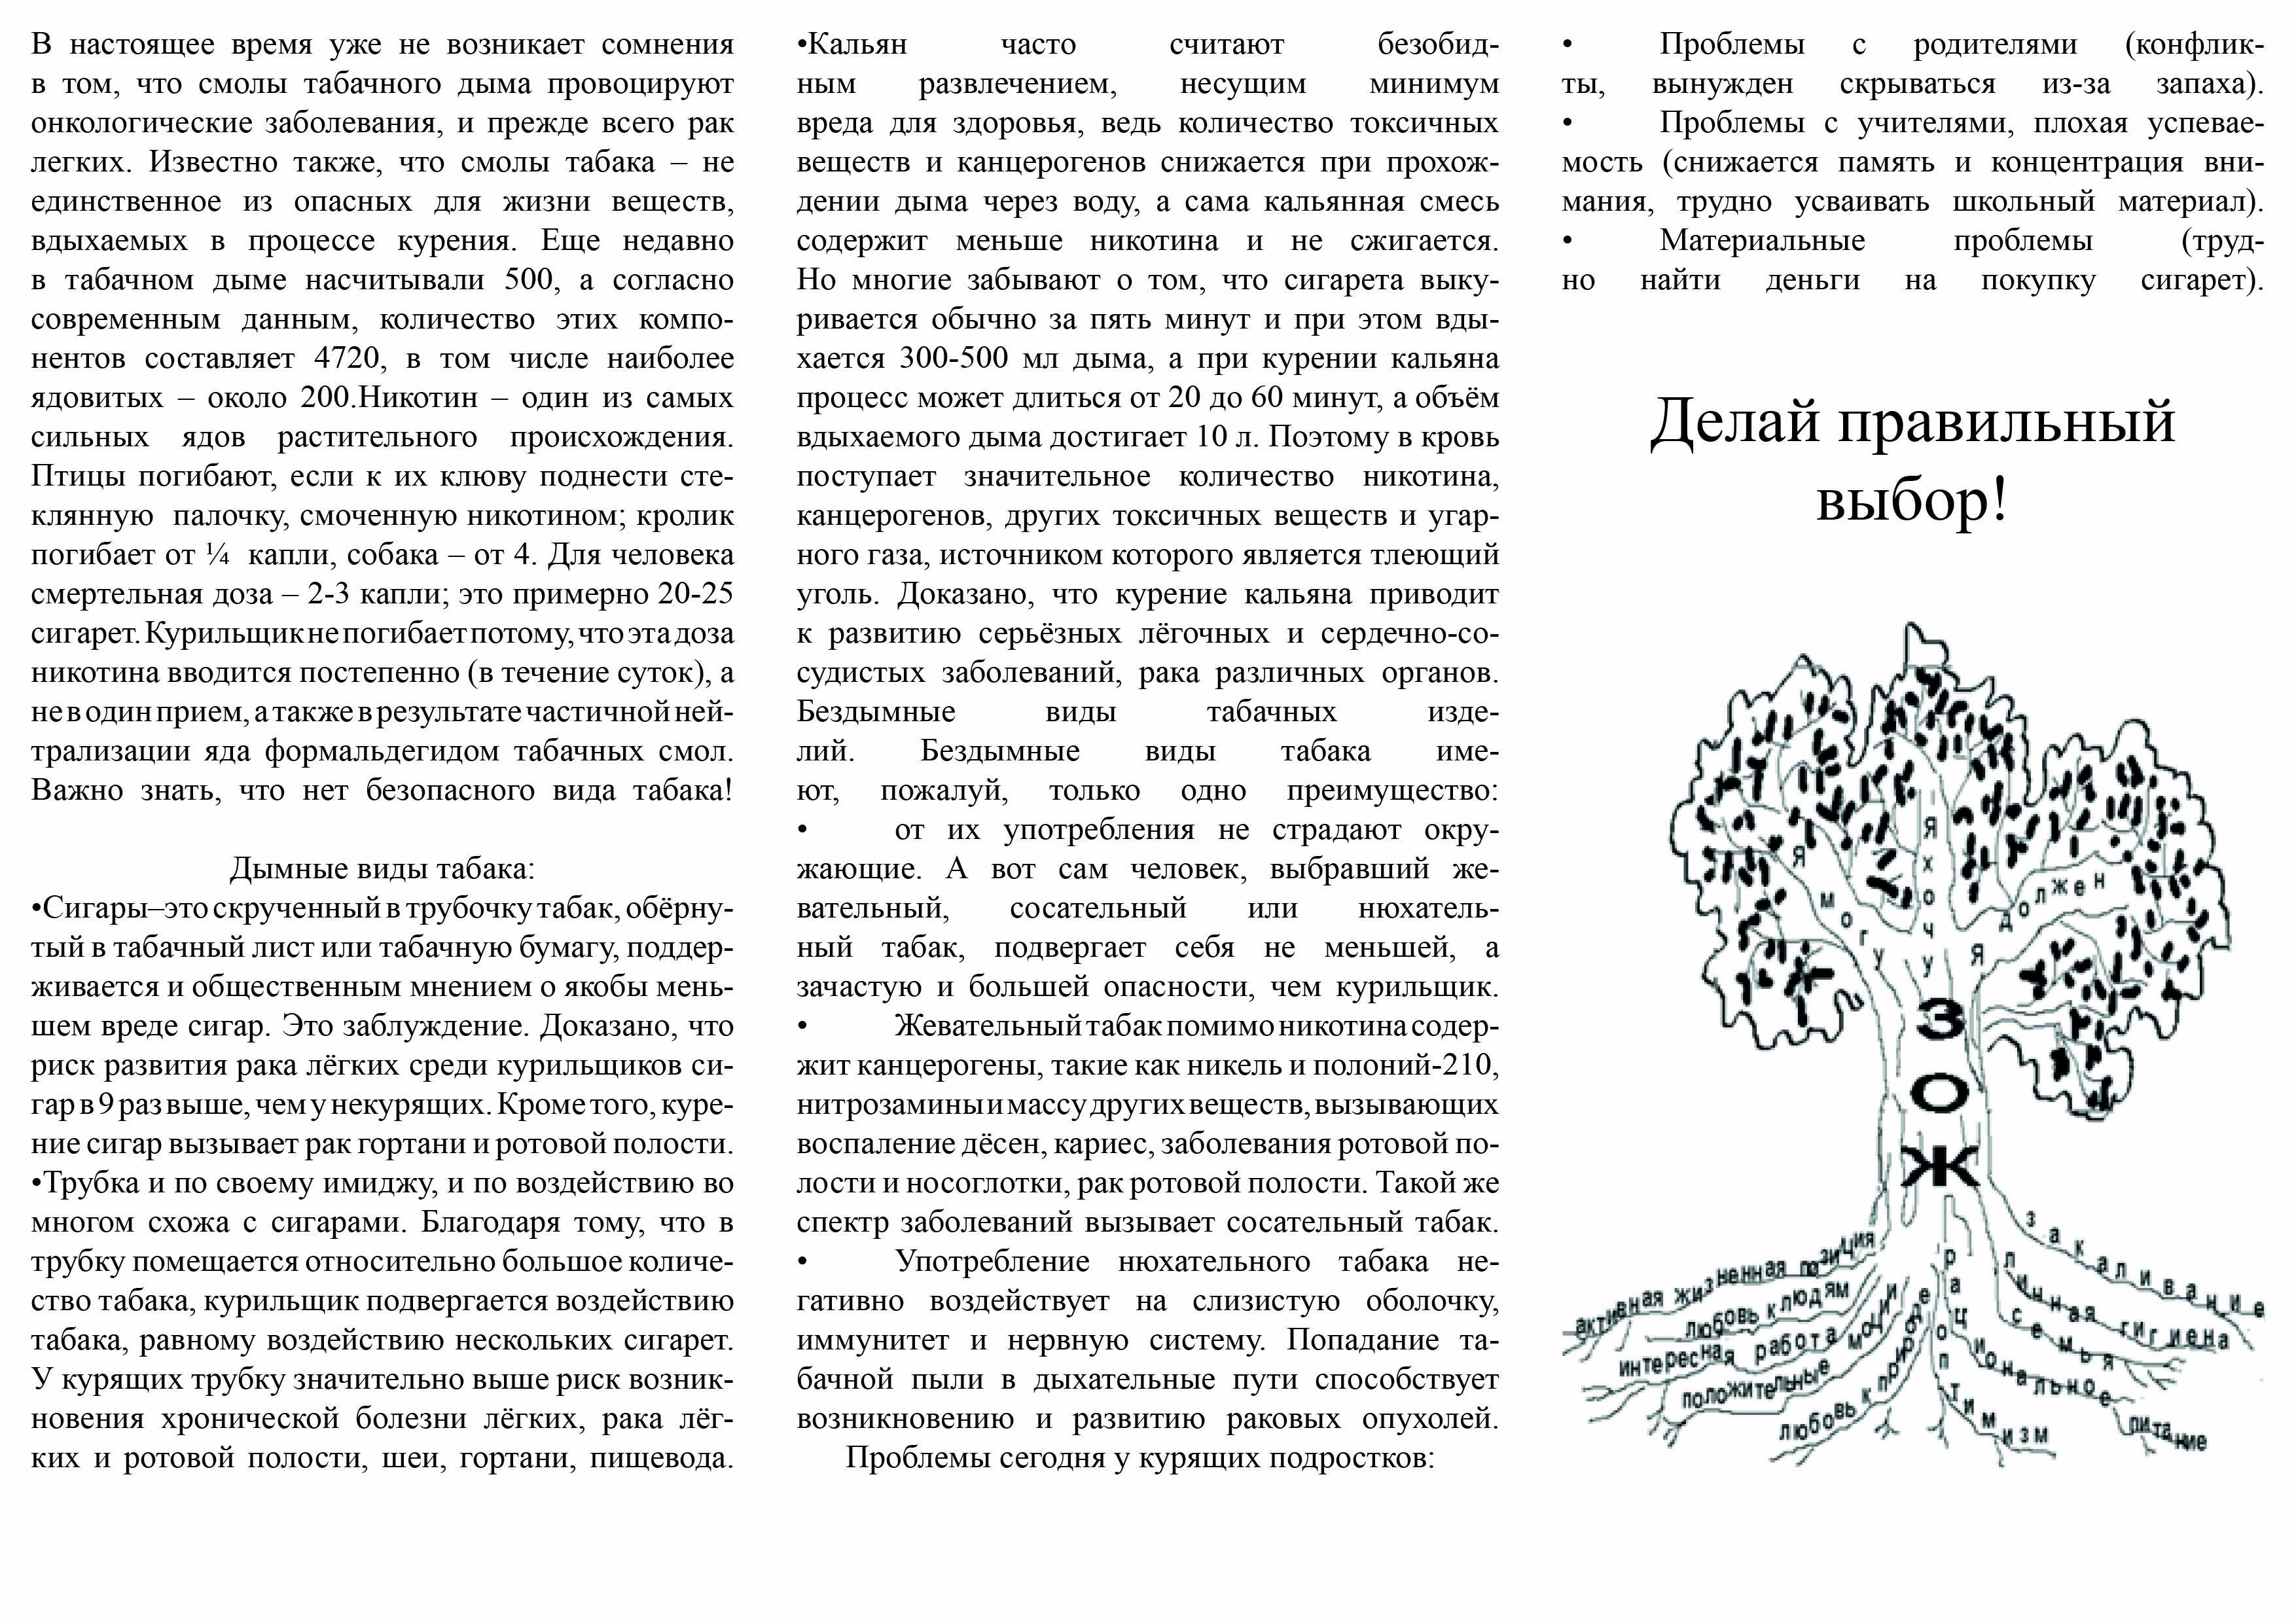 C:\Documents and Settings\user2pc\Рабочий стол\С чата\Ходакова Юлия Сергеевна\буклет2.jpg